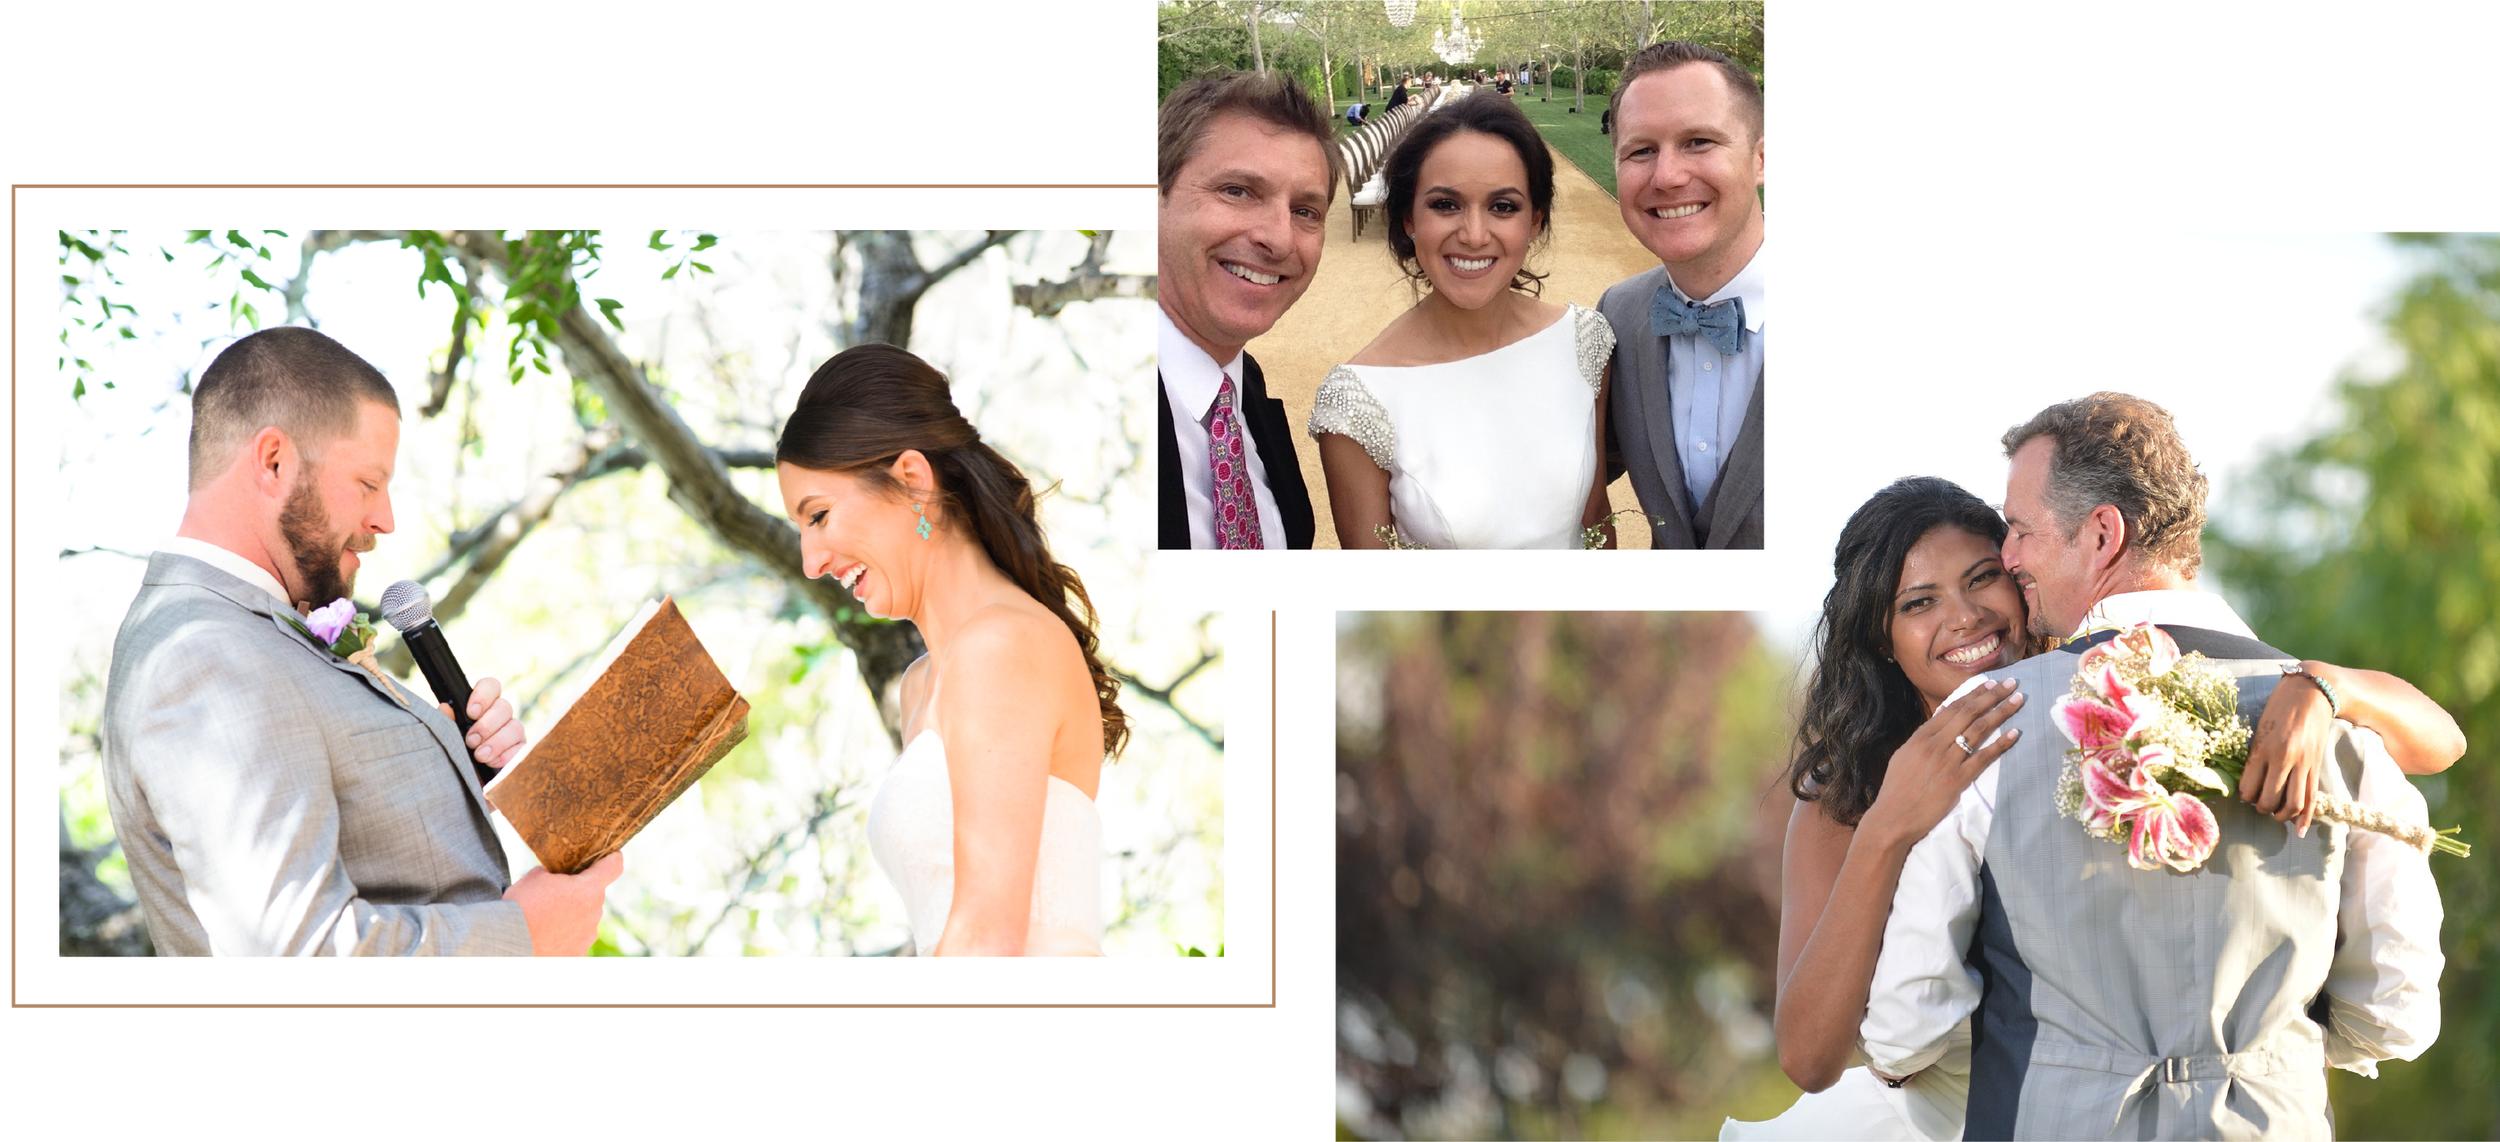 Santa Barbara Wedding DJs: Best DJ and Emcee Services in Santa Barbara